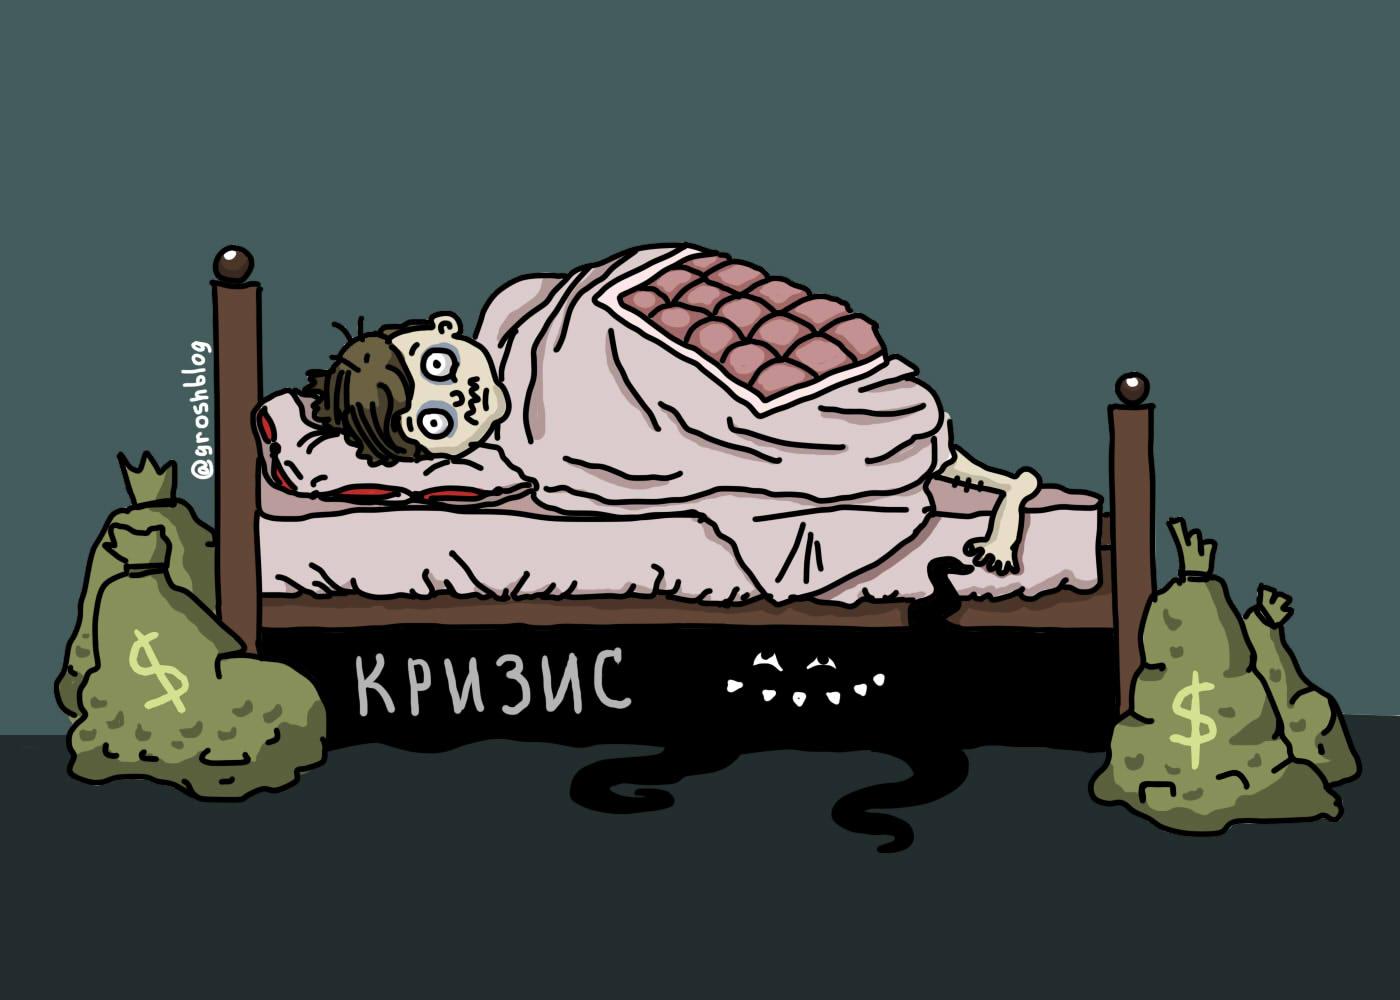 богачи и кризис журнал грош https://grosh-blog.ru/